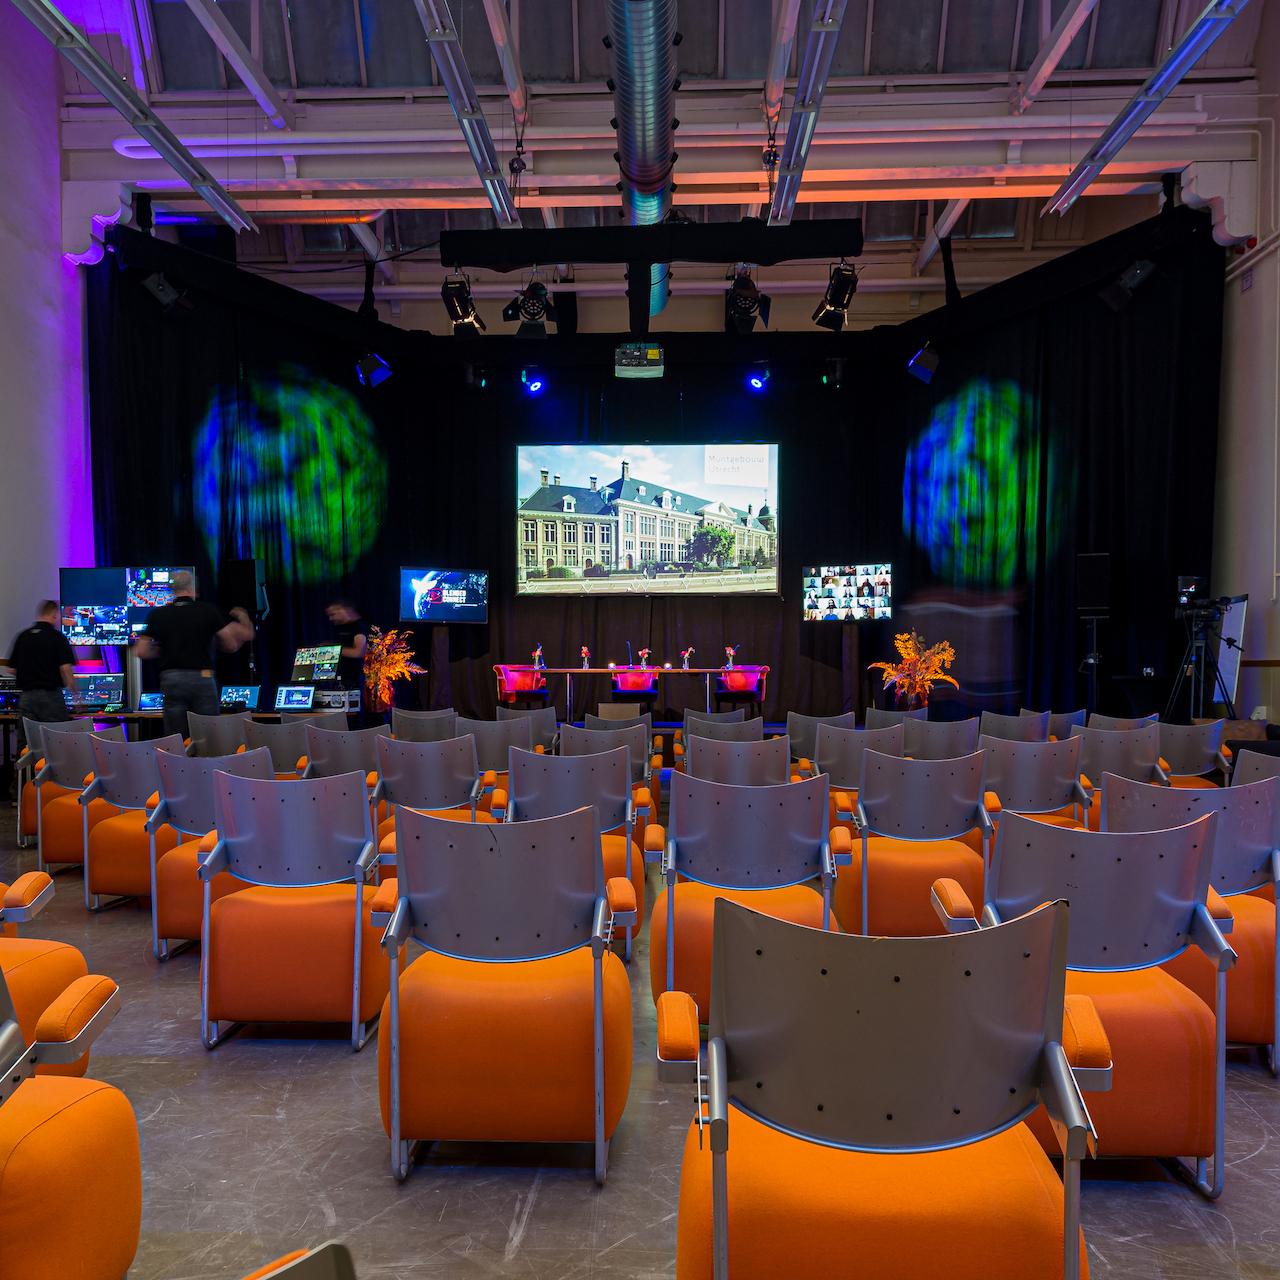 https://mluwrm0uc0jv.i.optimole.com/k7WnSnM-AXHYMC5t/w:320/h:320/q:auto/https://www.blendedconnect.nl/wp-content/uploads/2020/06/online_event.jpg